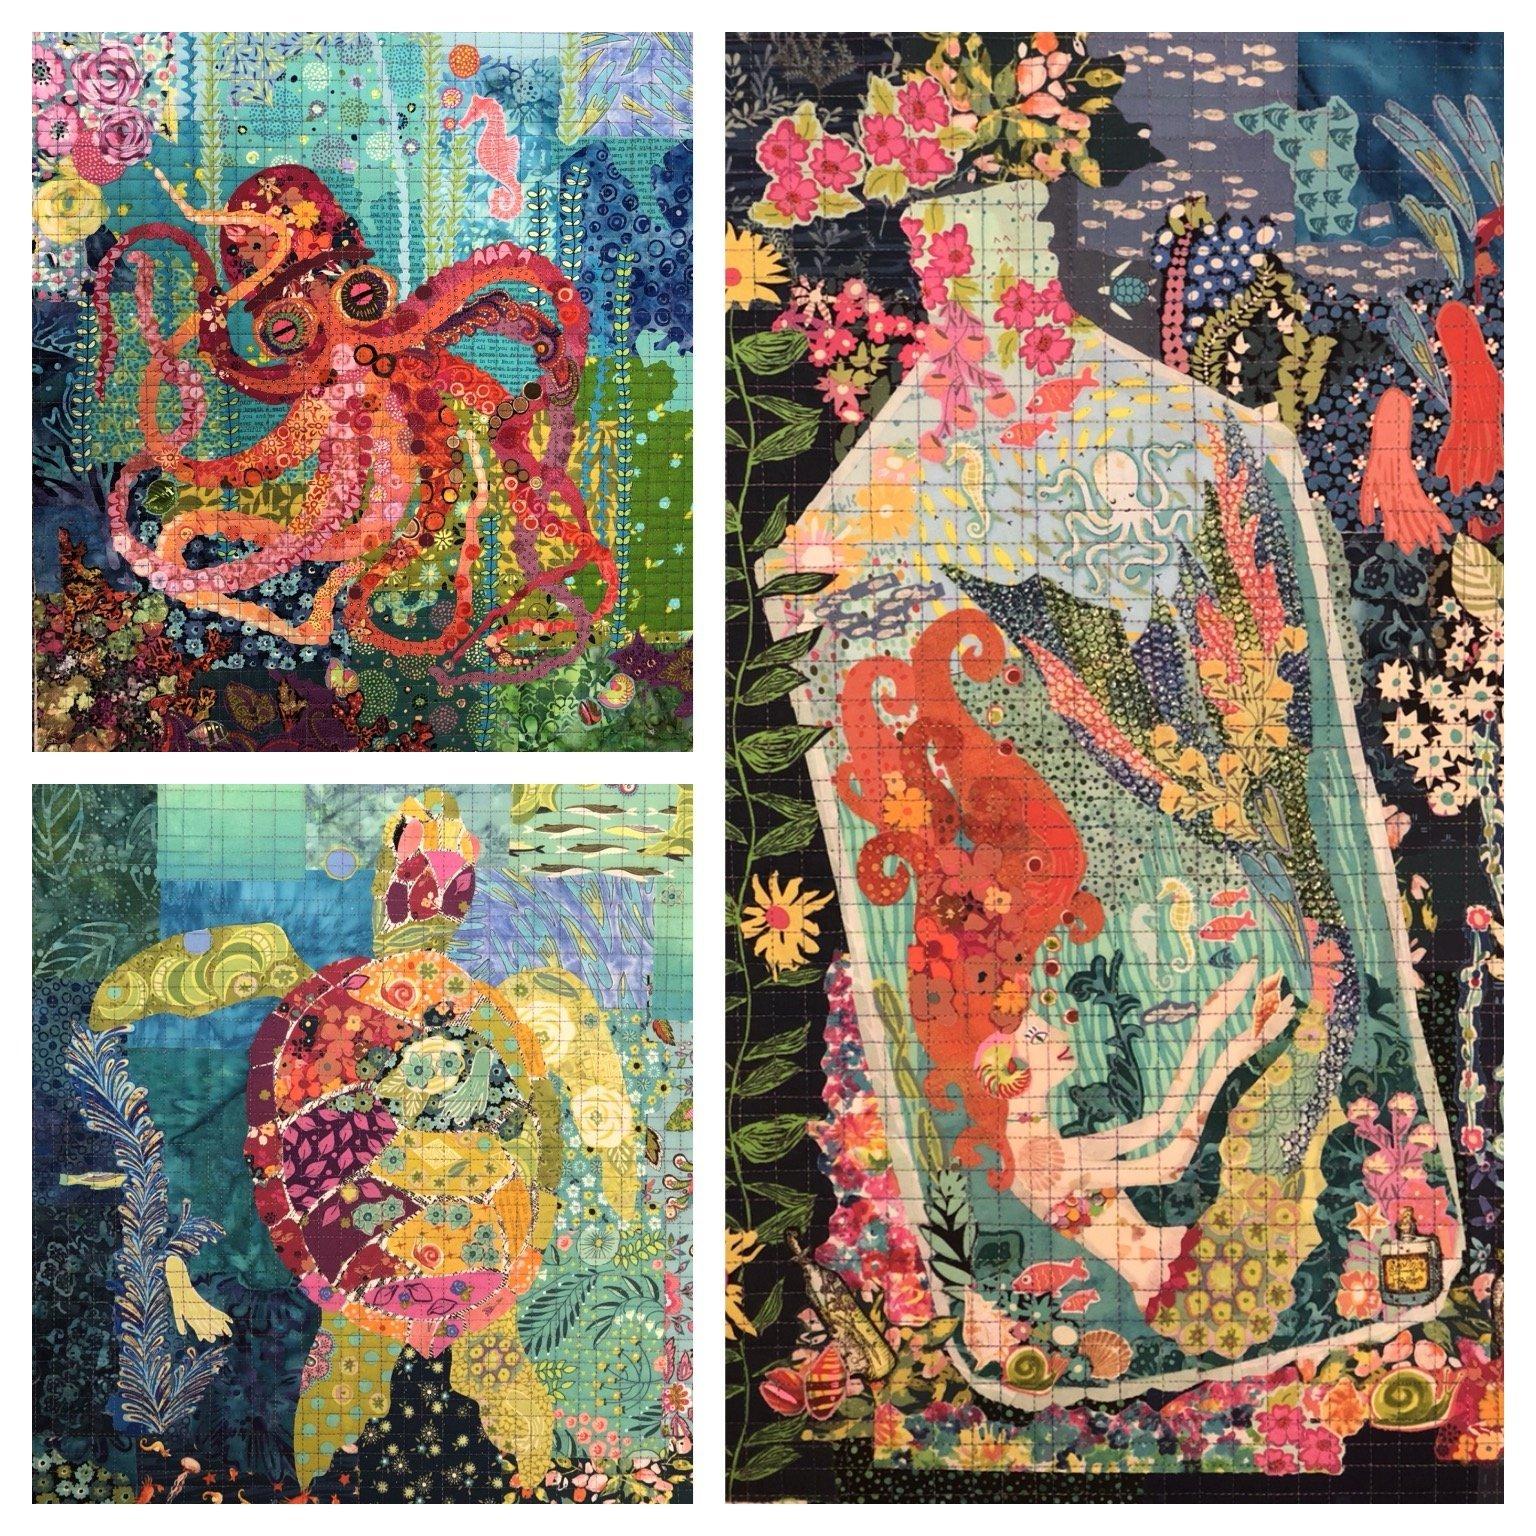 Teeny Tiny Collage #4 pattern